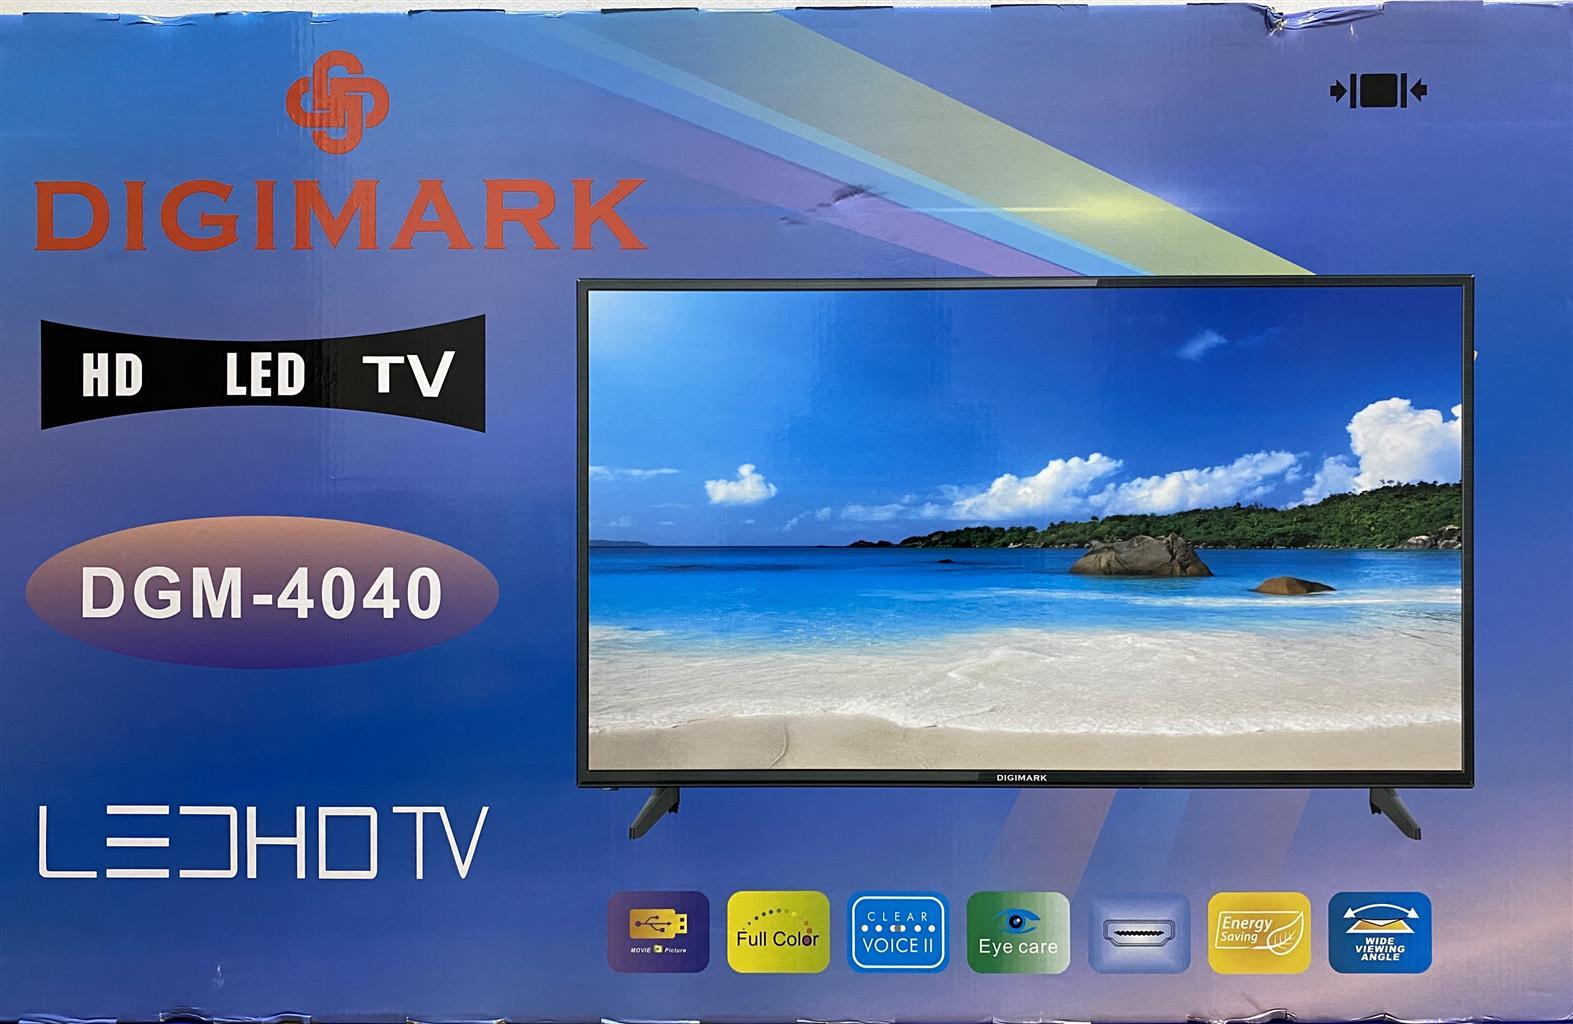 40 inch DIGIMARK tvs